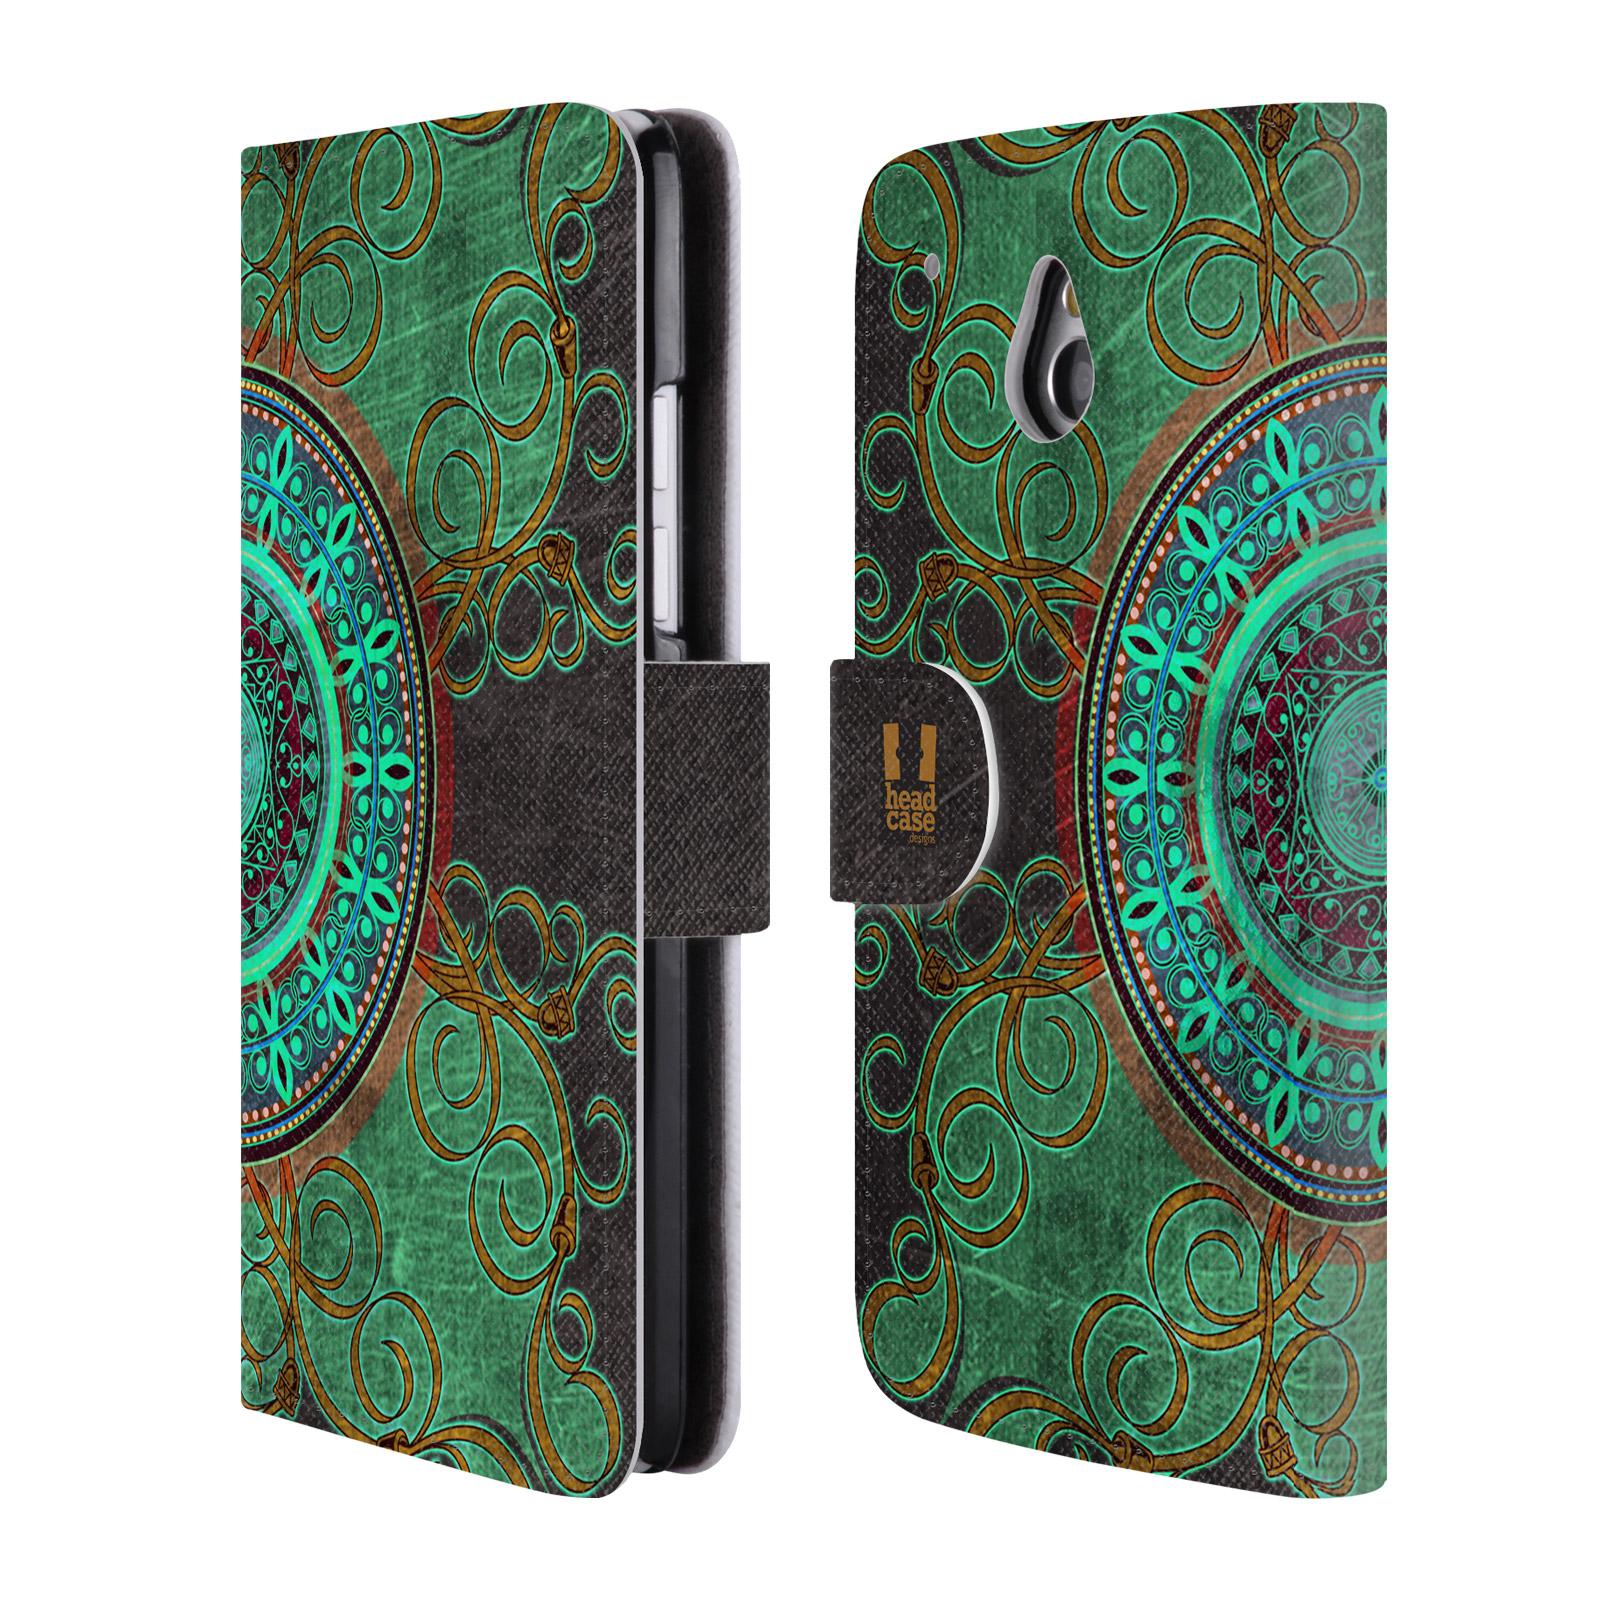 HEAD CASE Flipové pouzdro pro mobil HTC ONE MINI (M4) ARABESKA mandala zelená